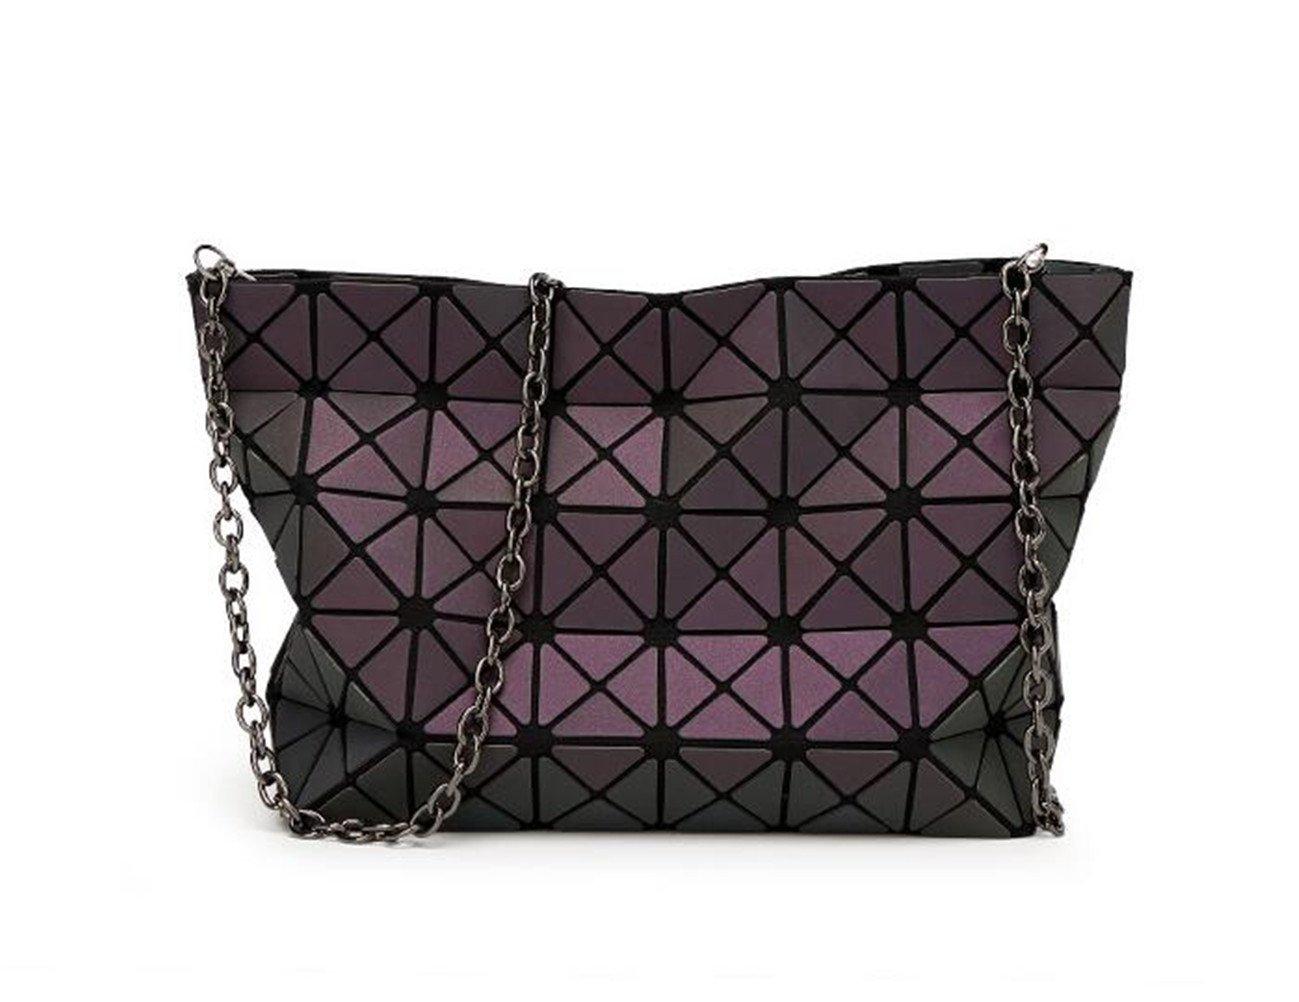 Style Women-Bag Geometry Casual Totes Shoulder Bag Hologram Luminous Bag Logo Inside Silver